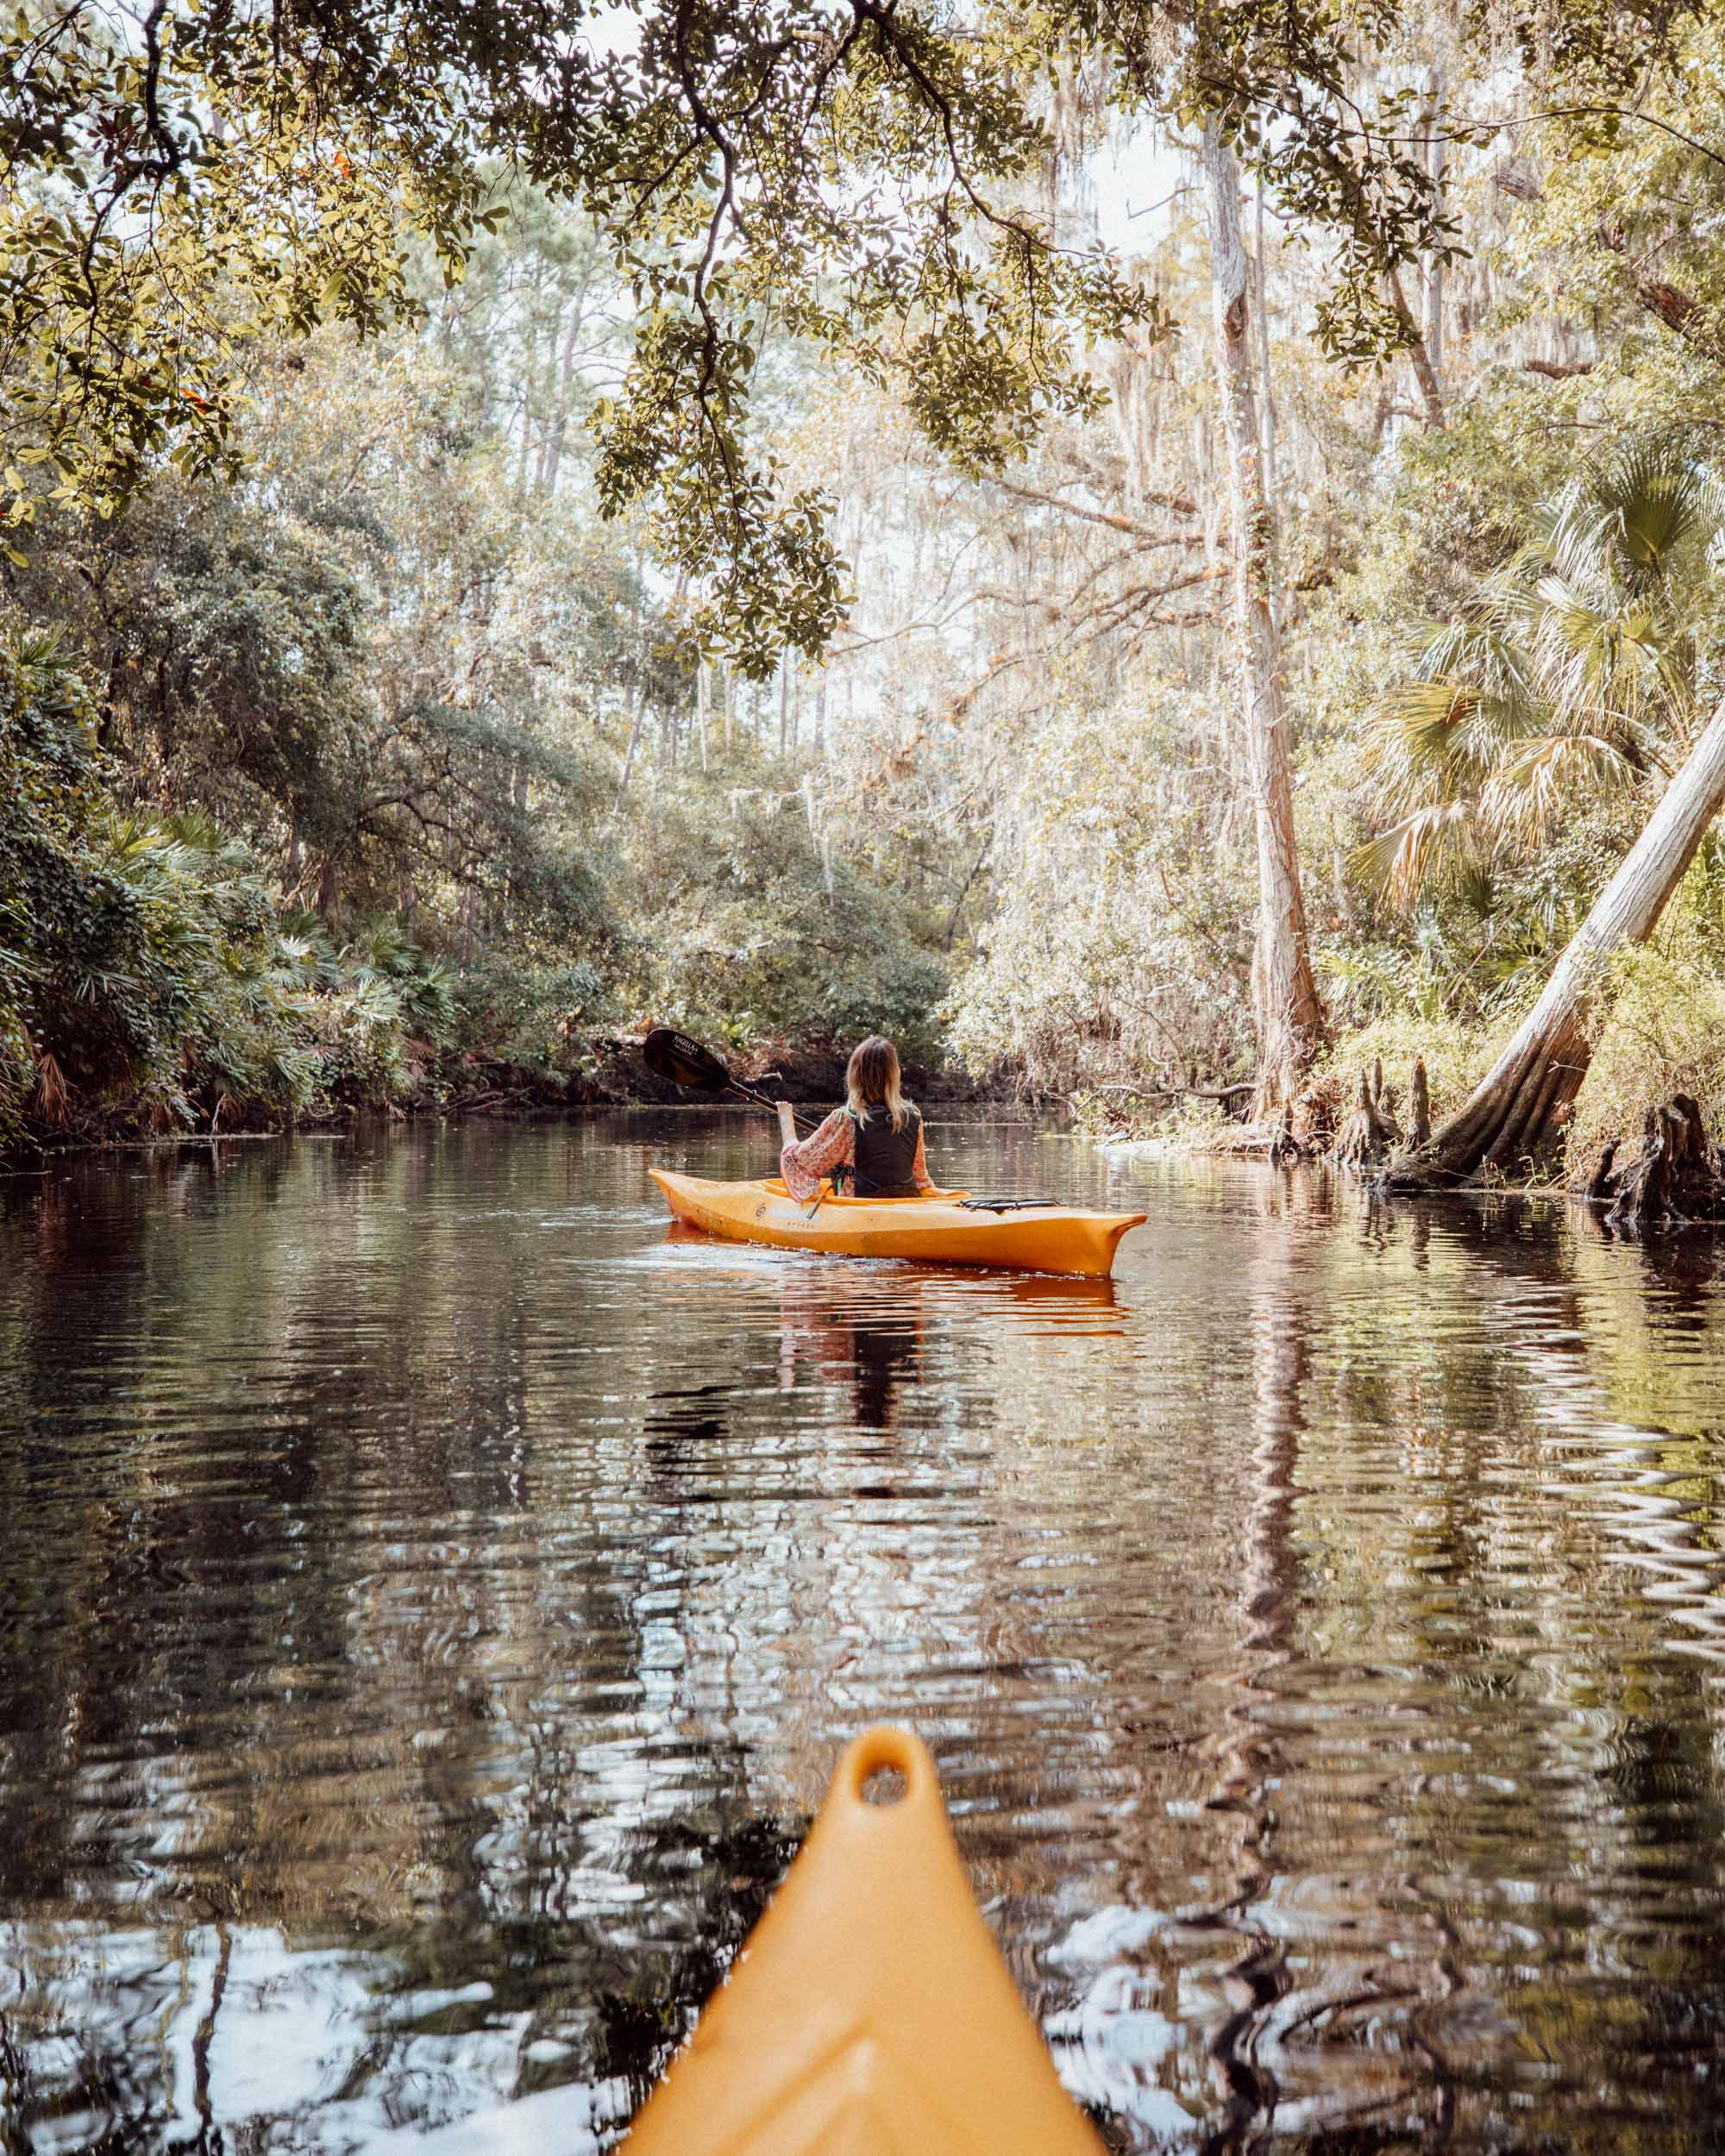 Kayaking at Shingle Creek in Kissimmee Florida